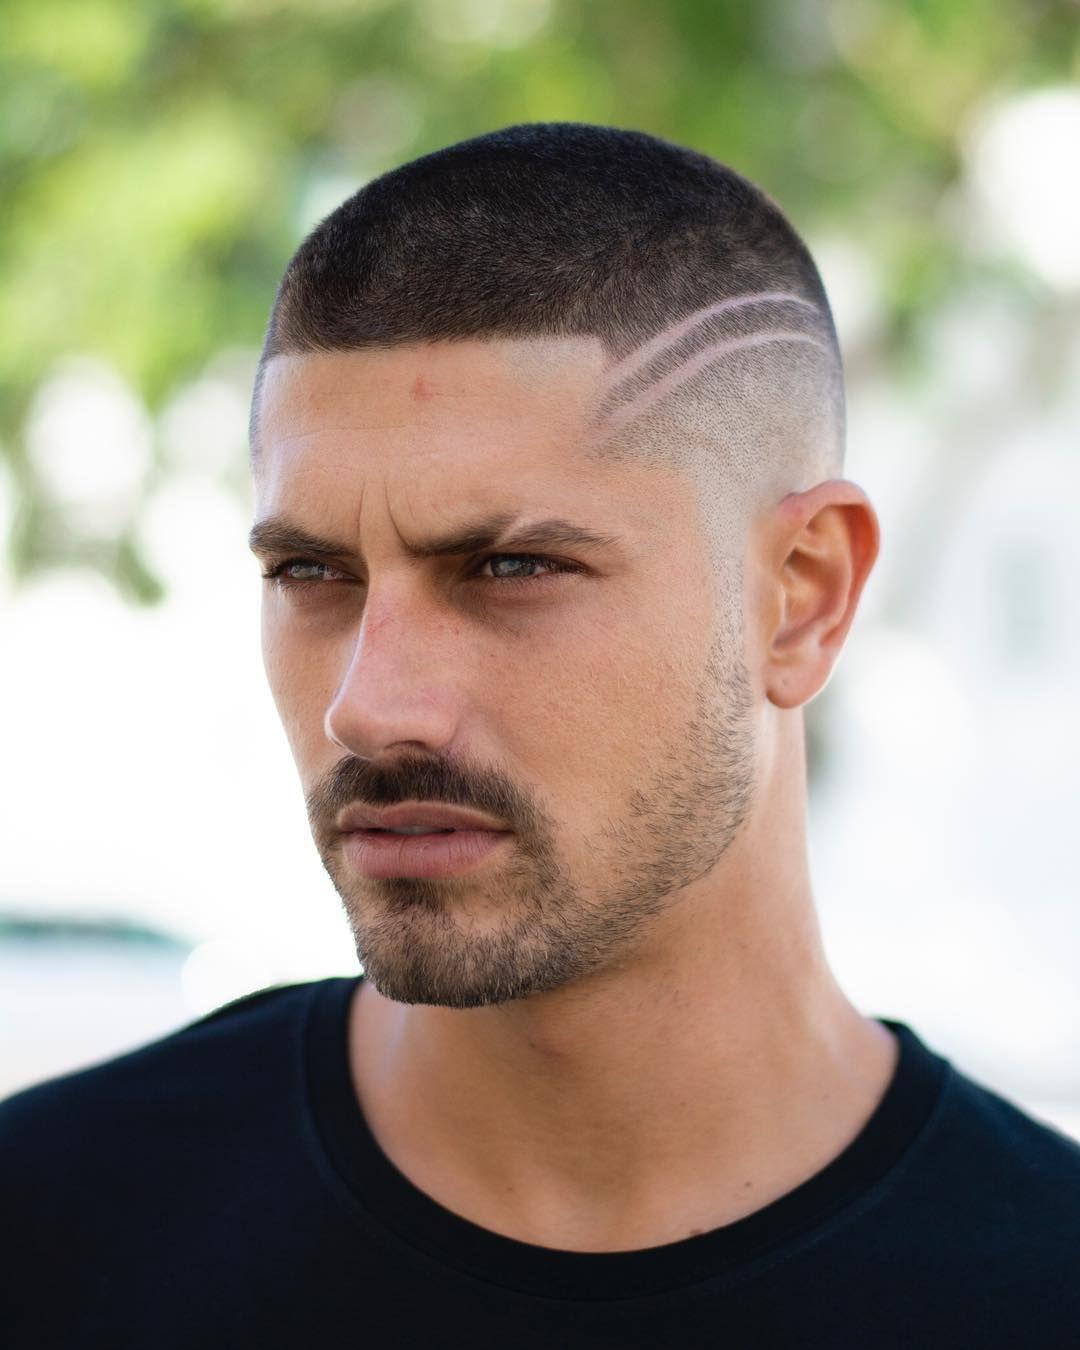 best new men's hairstyles | beard | shaved hair designs